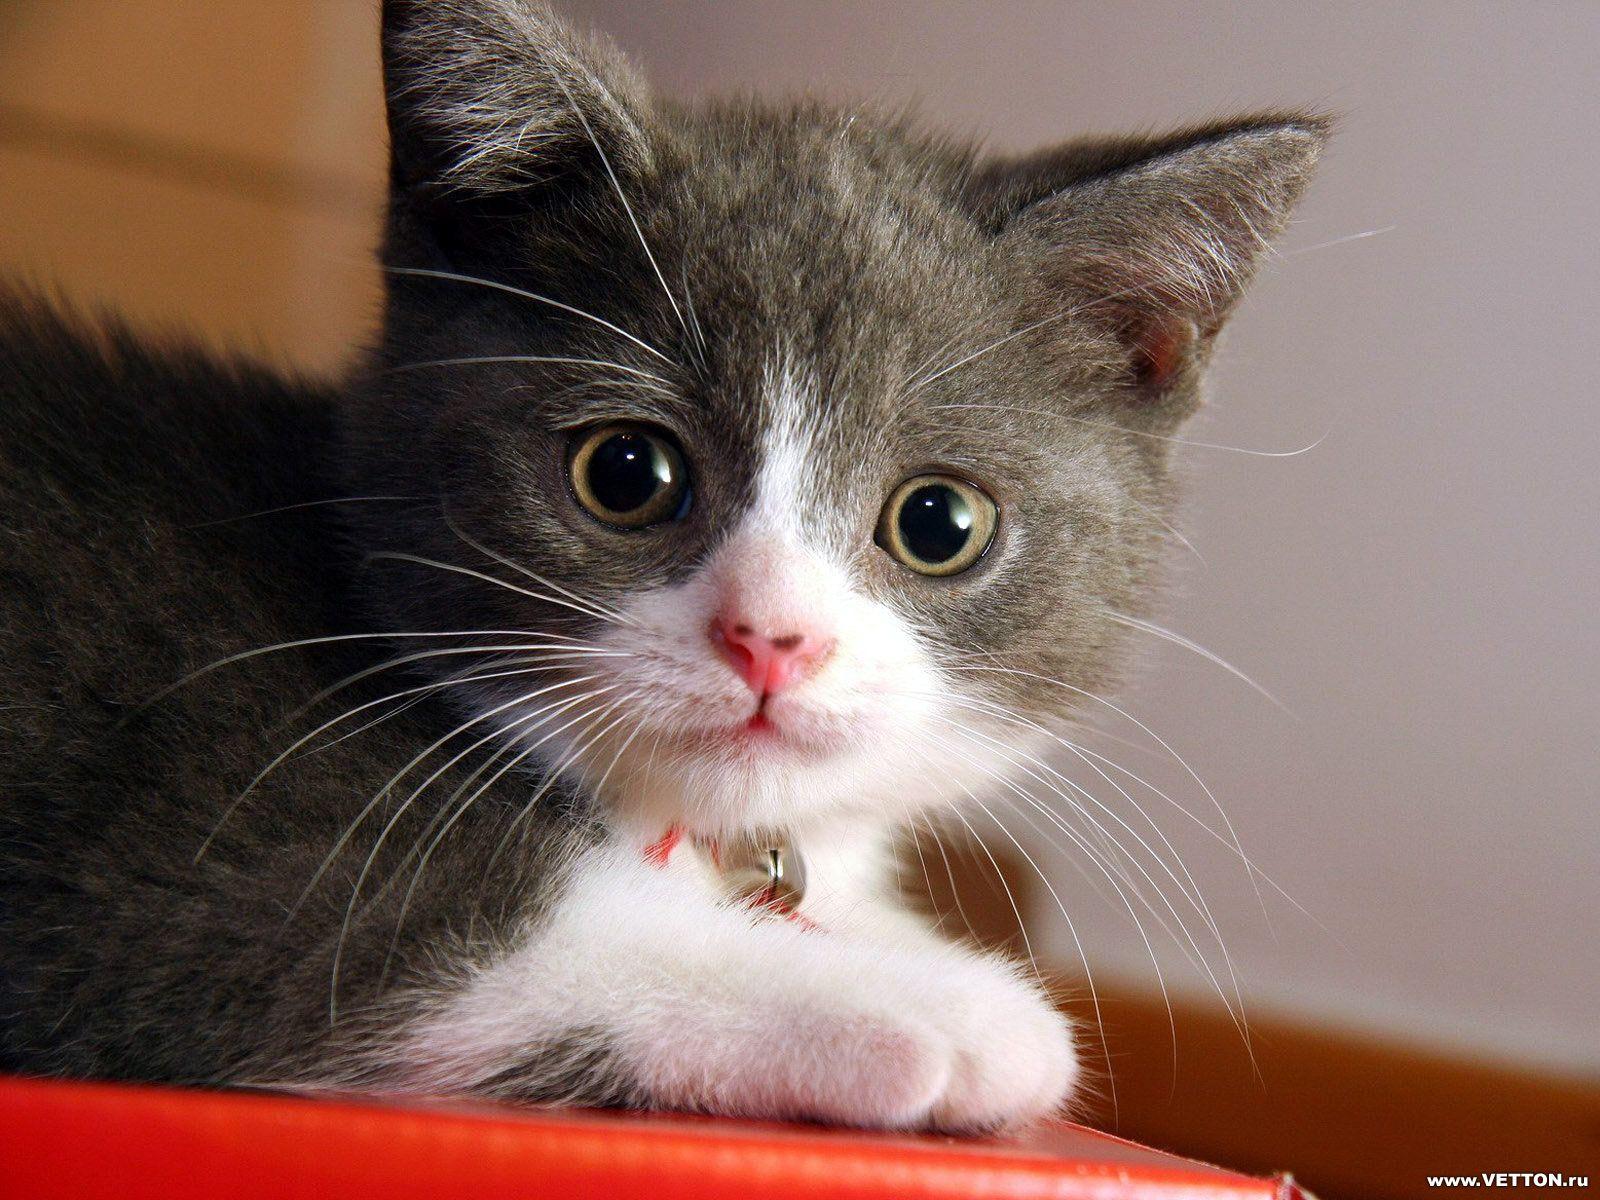 Фото котенка, скачать бесплатно фото котенка.: http://www.textopics.ru/name-images-727.php